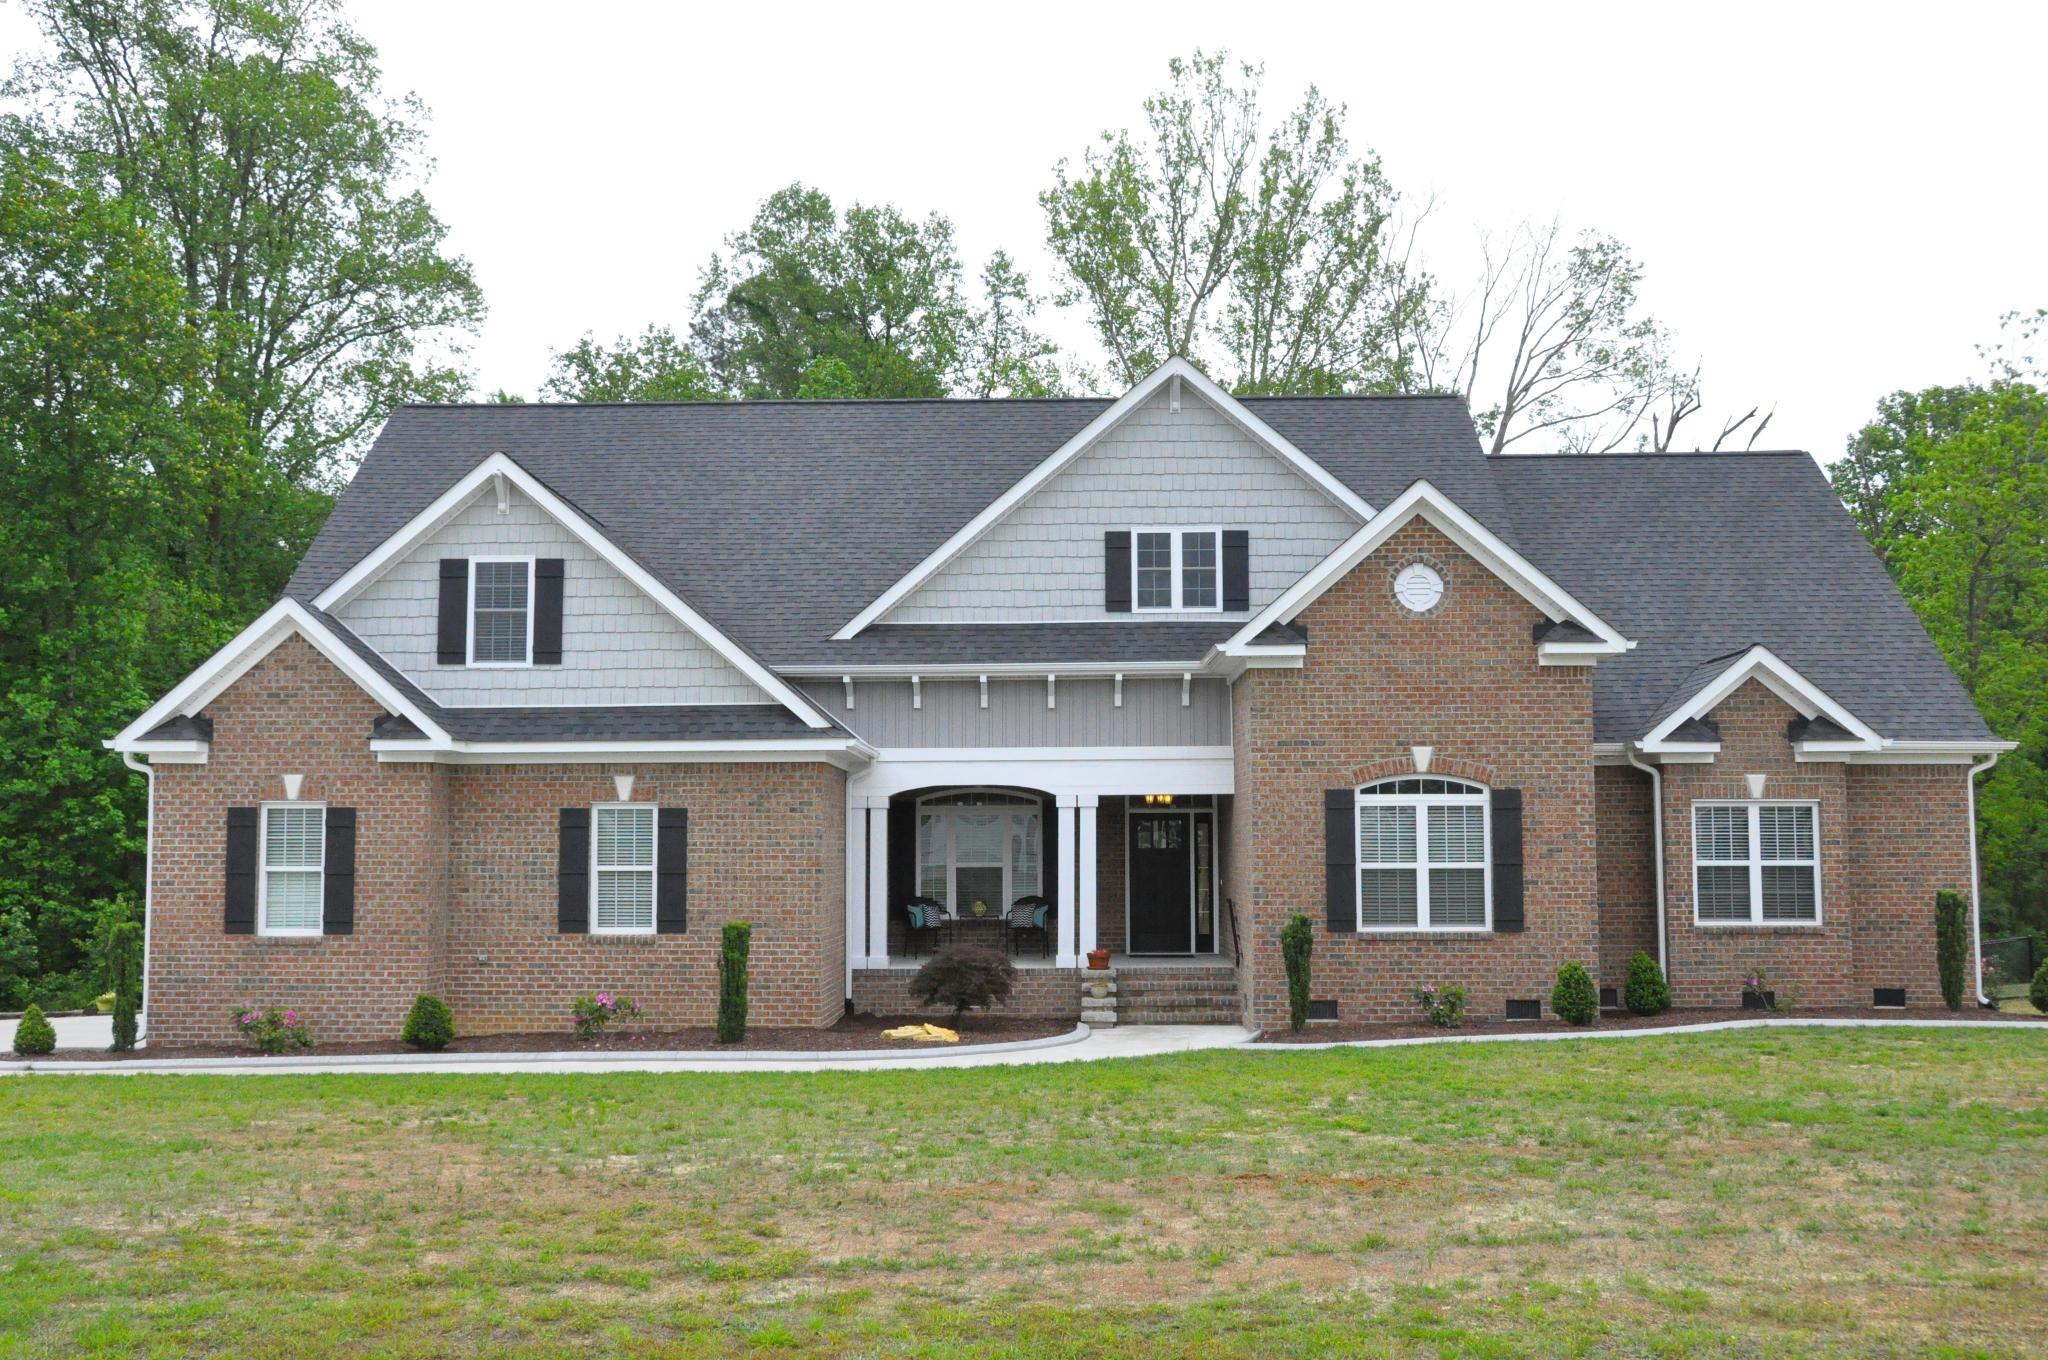 106 Bryan Pond Ln, Goldsboro, NC 27530 - Estimate and Home Details ...